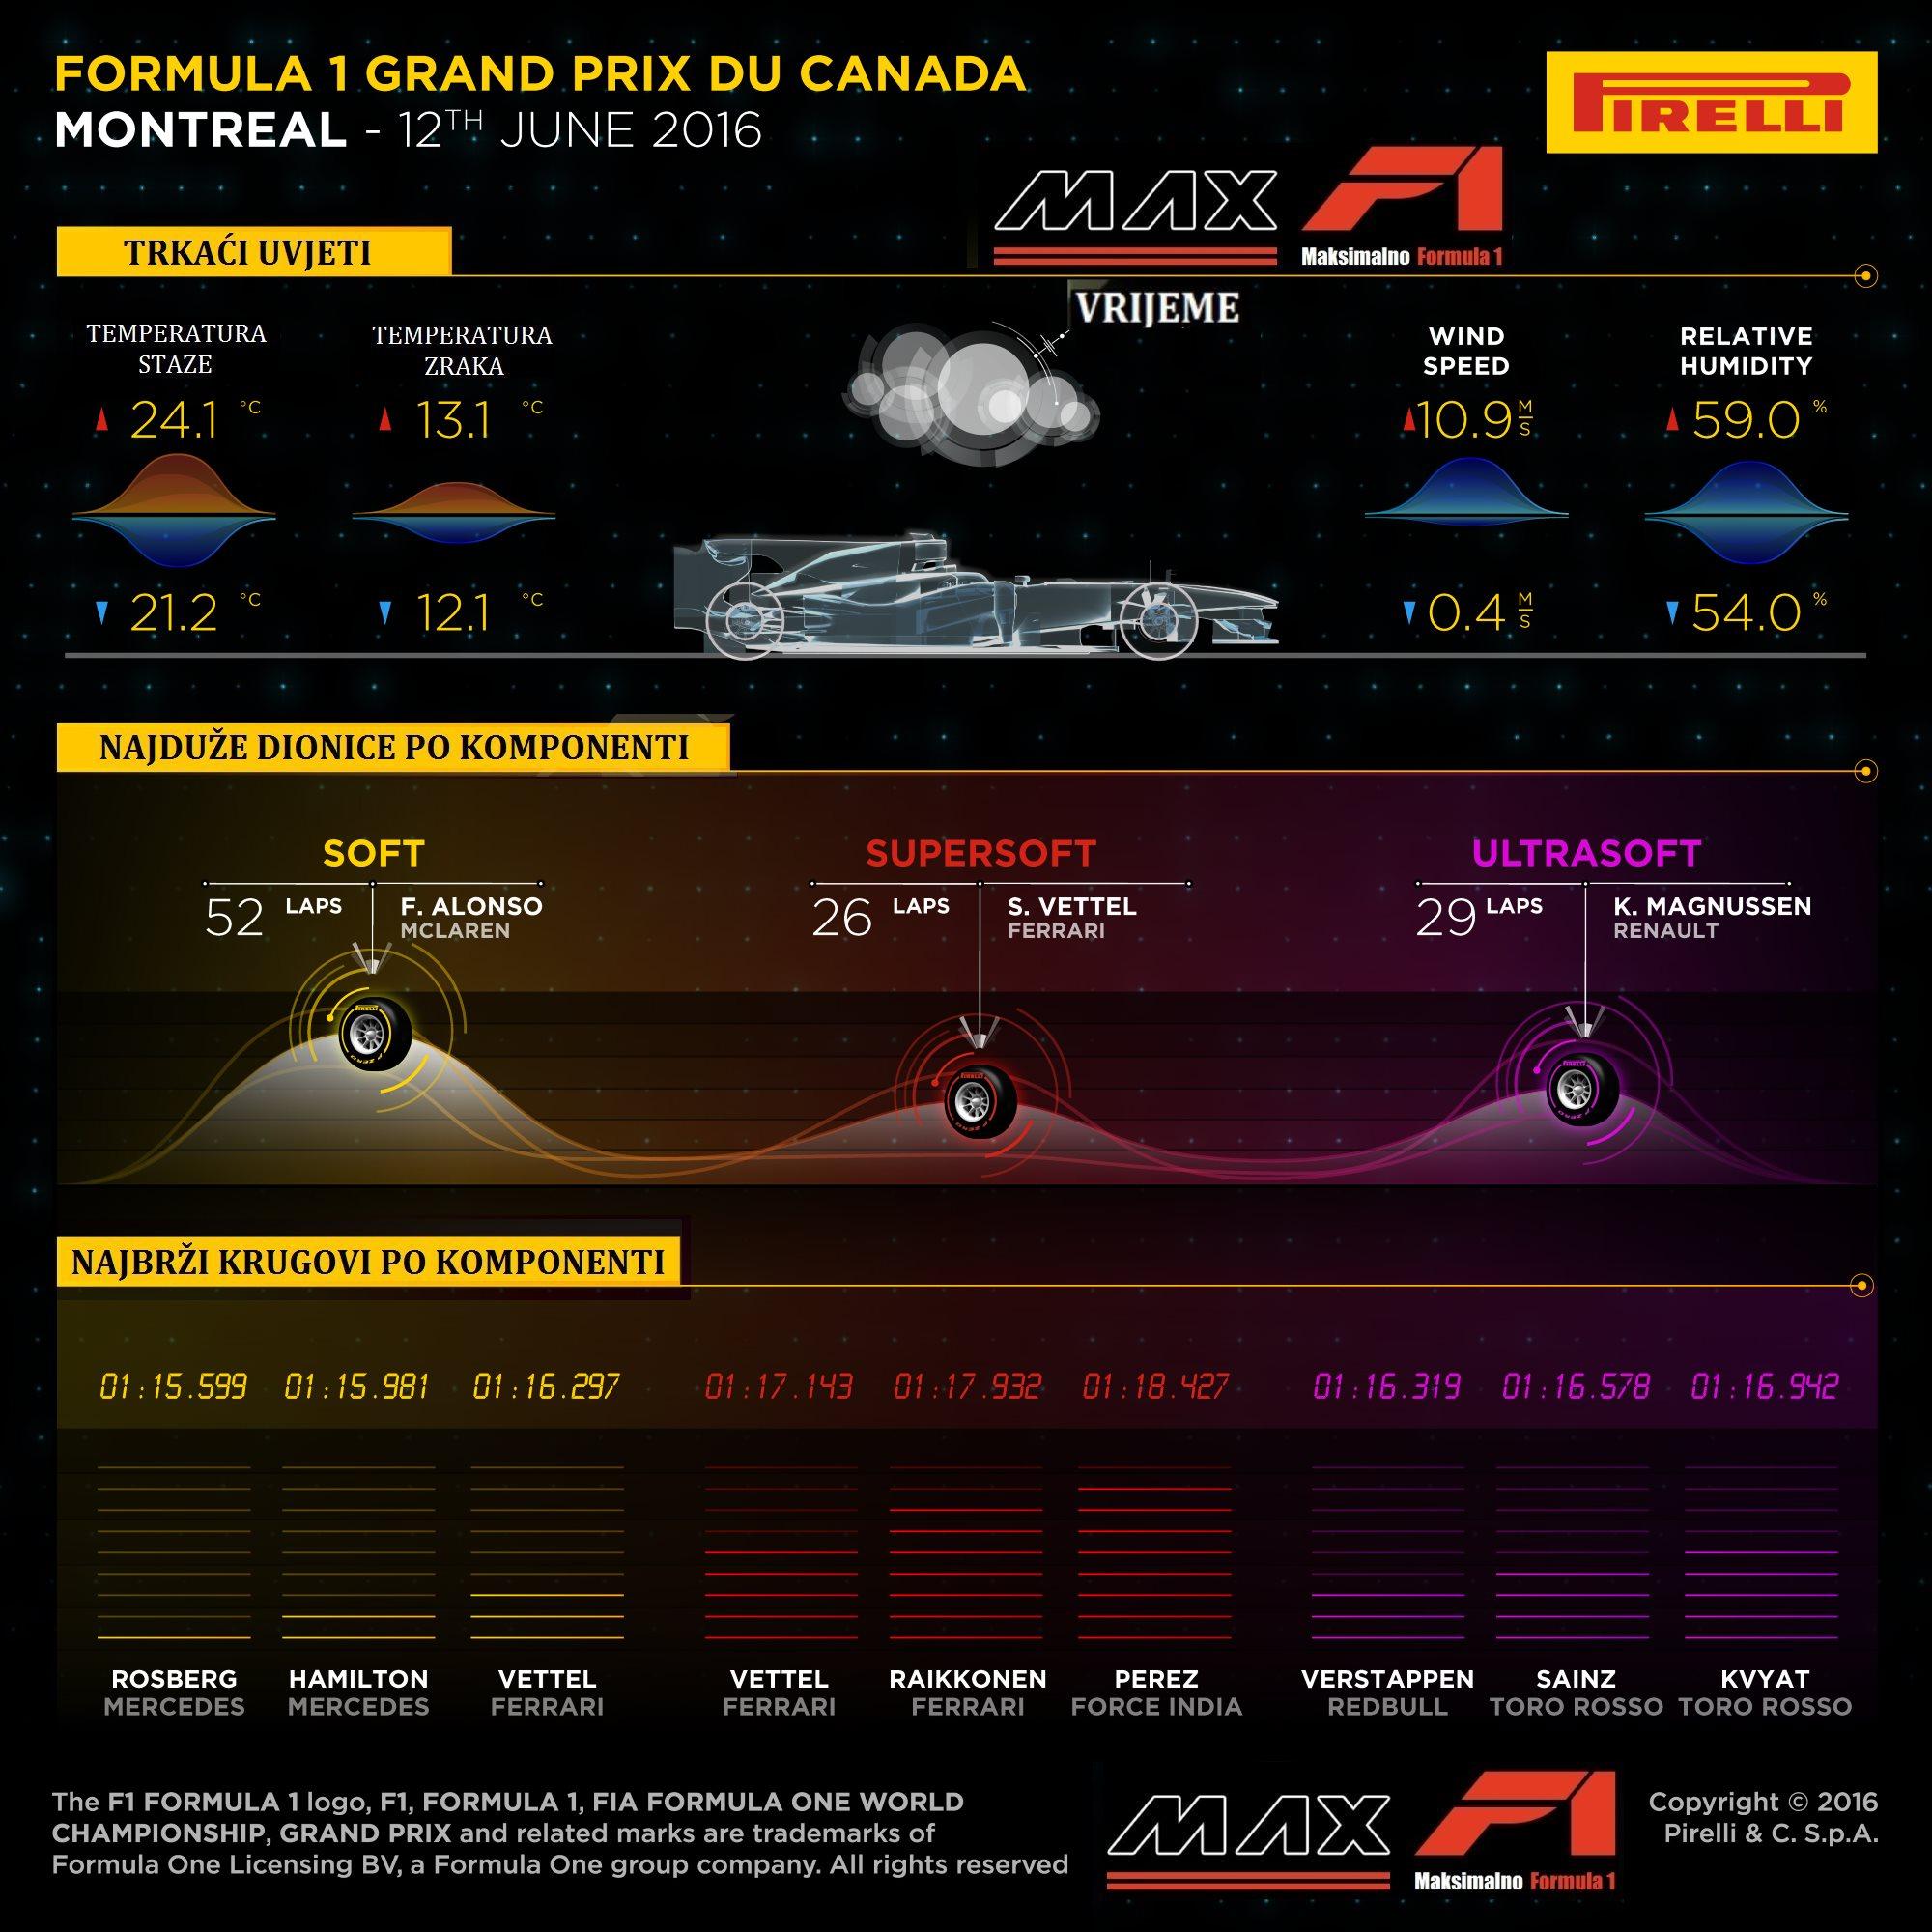 Pirelli F1 fastest laps per compound Canada F1 2016 MaxF1-net translation